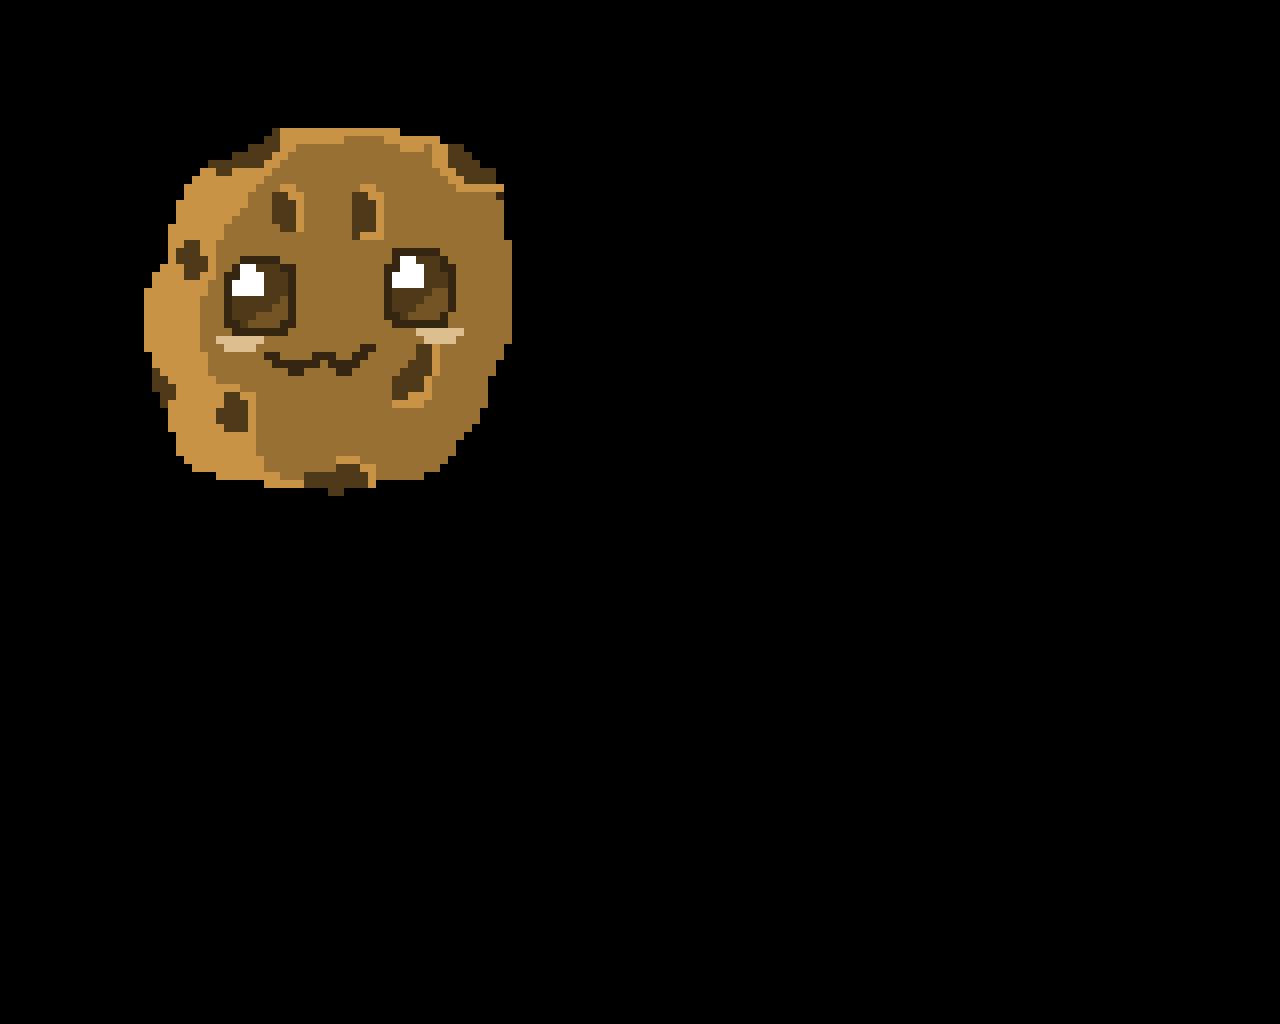 cookie swirl C - hehehehe